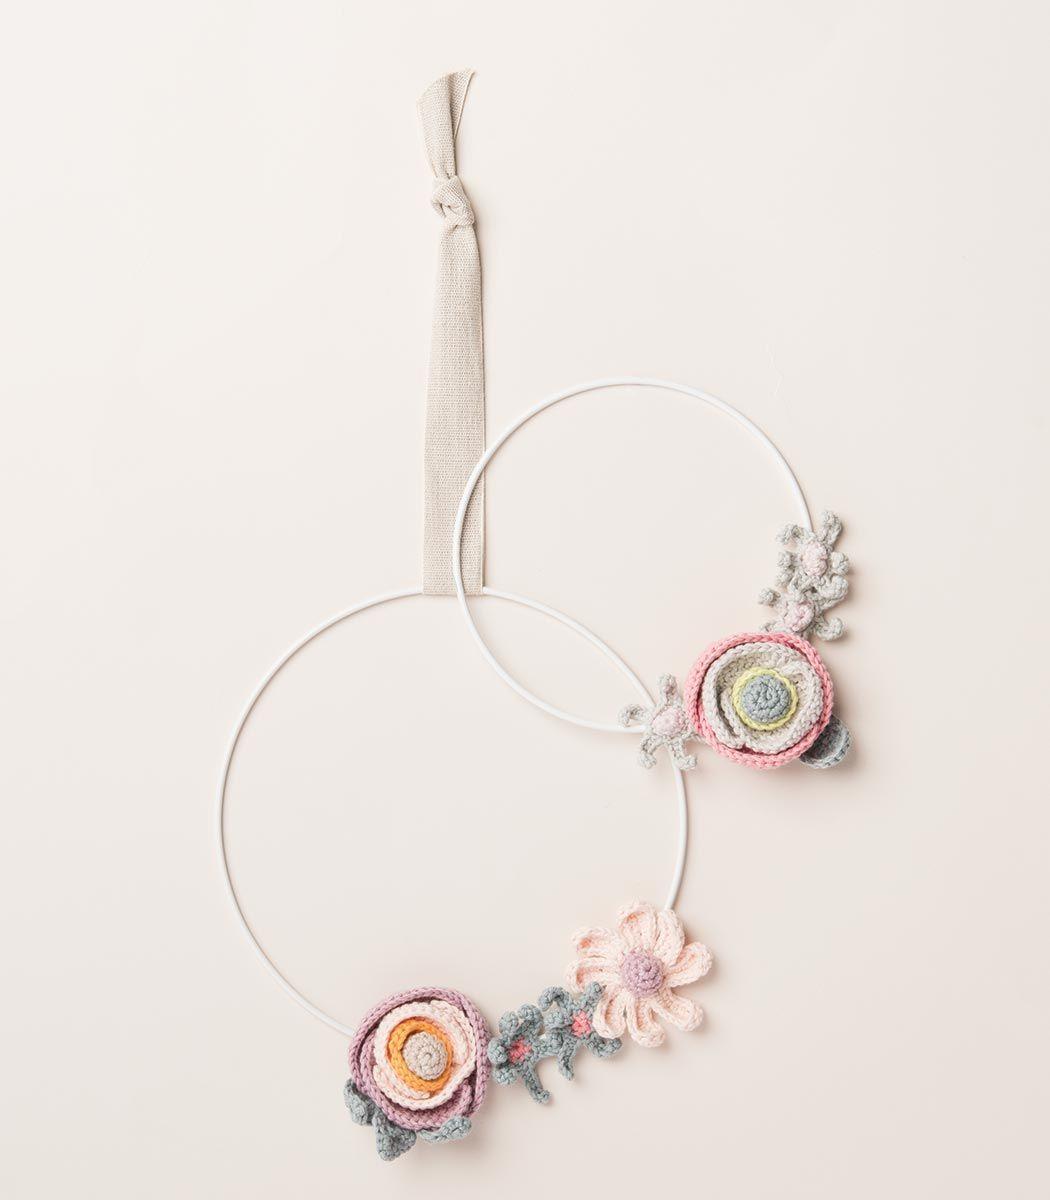 Kit crochet amigurumi - Fleur étoile